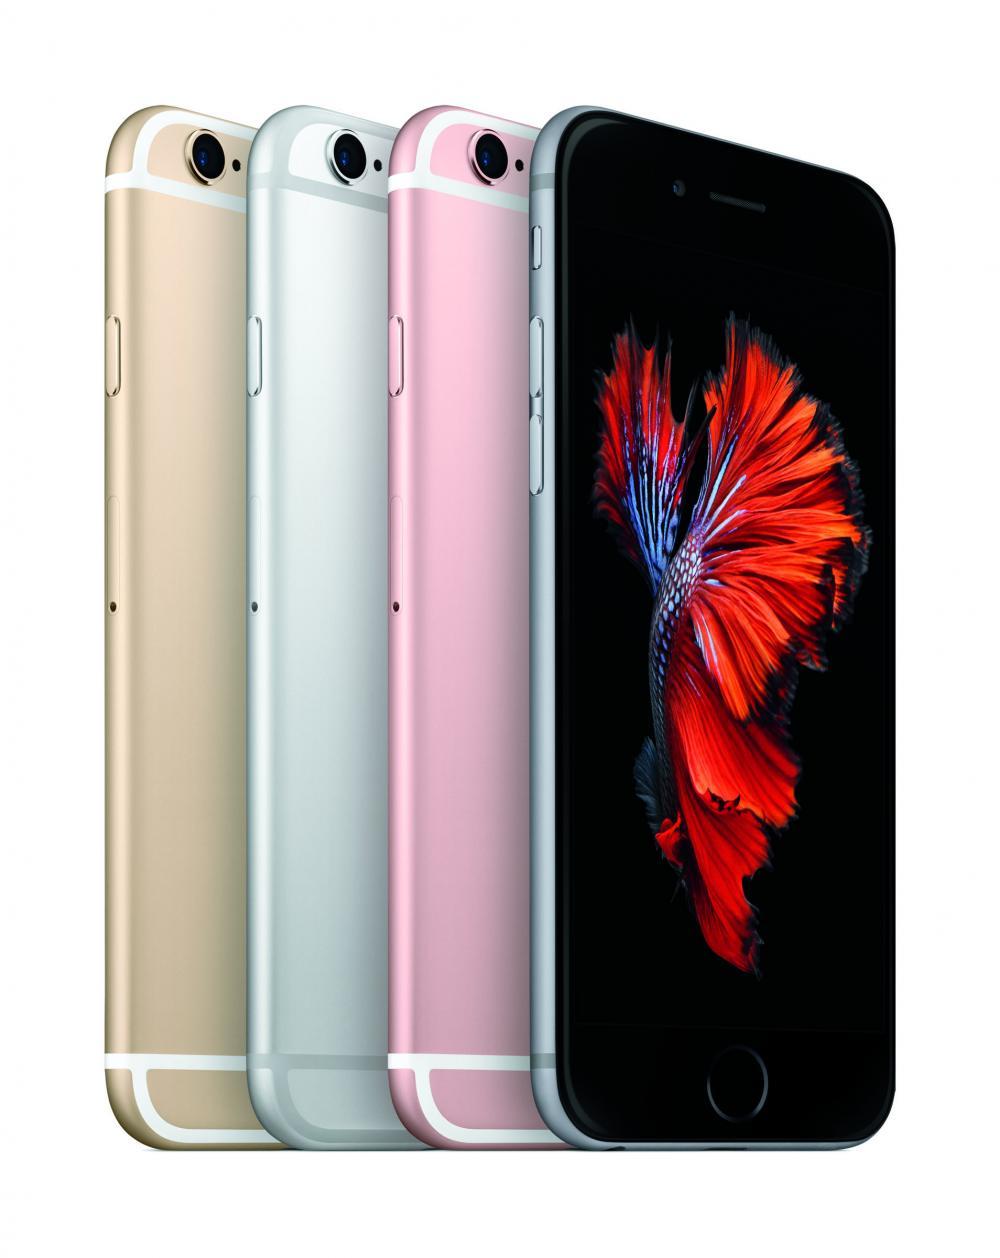 iPhone 6s 32GB προσφορά με τιμή 249 ευρώ